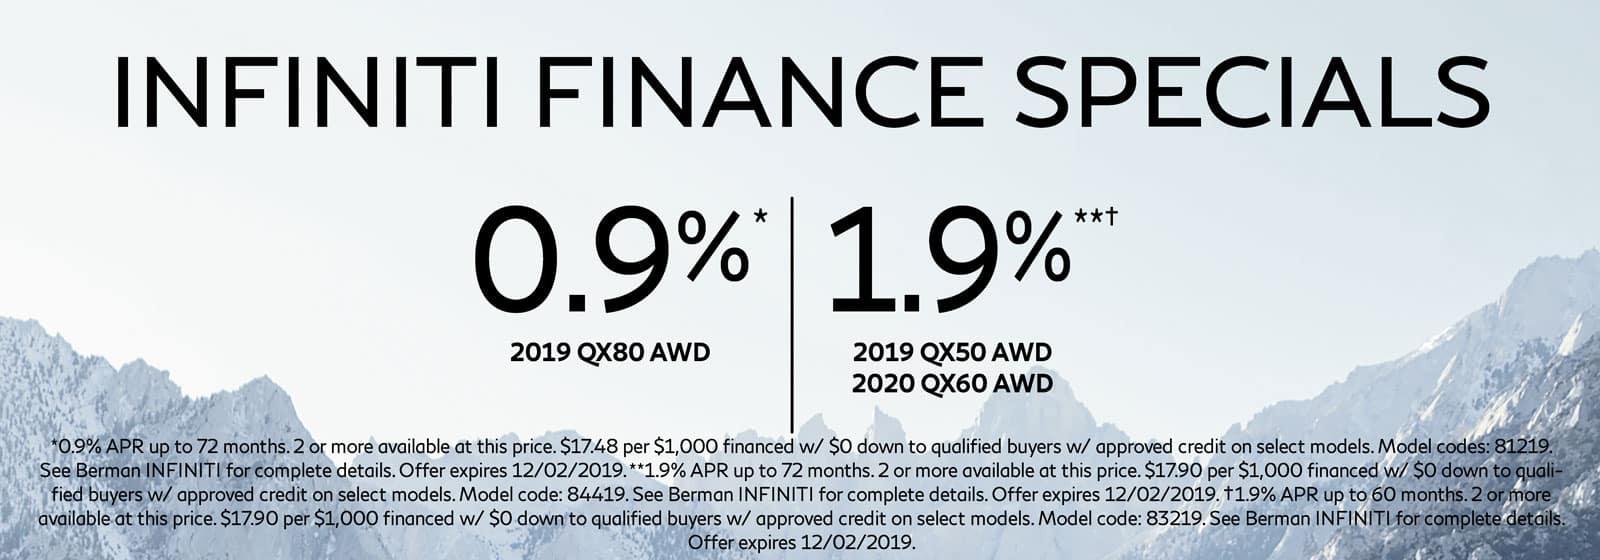 Finance Specials at Berman INFINITI of Niles